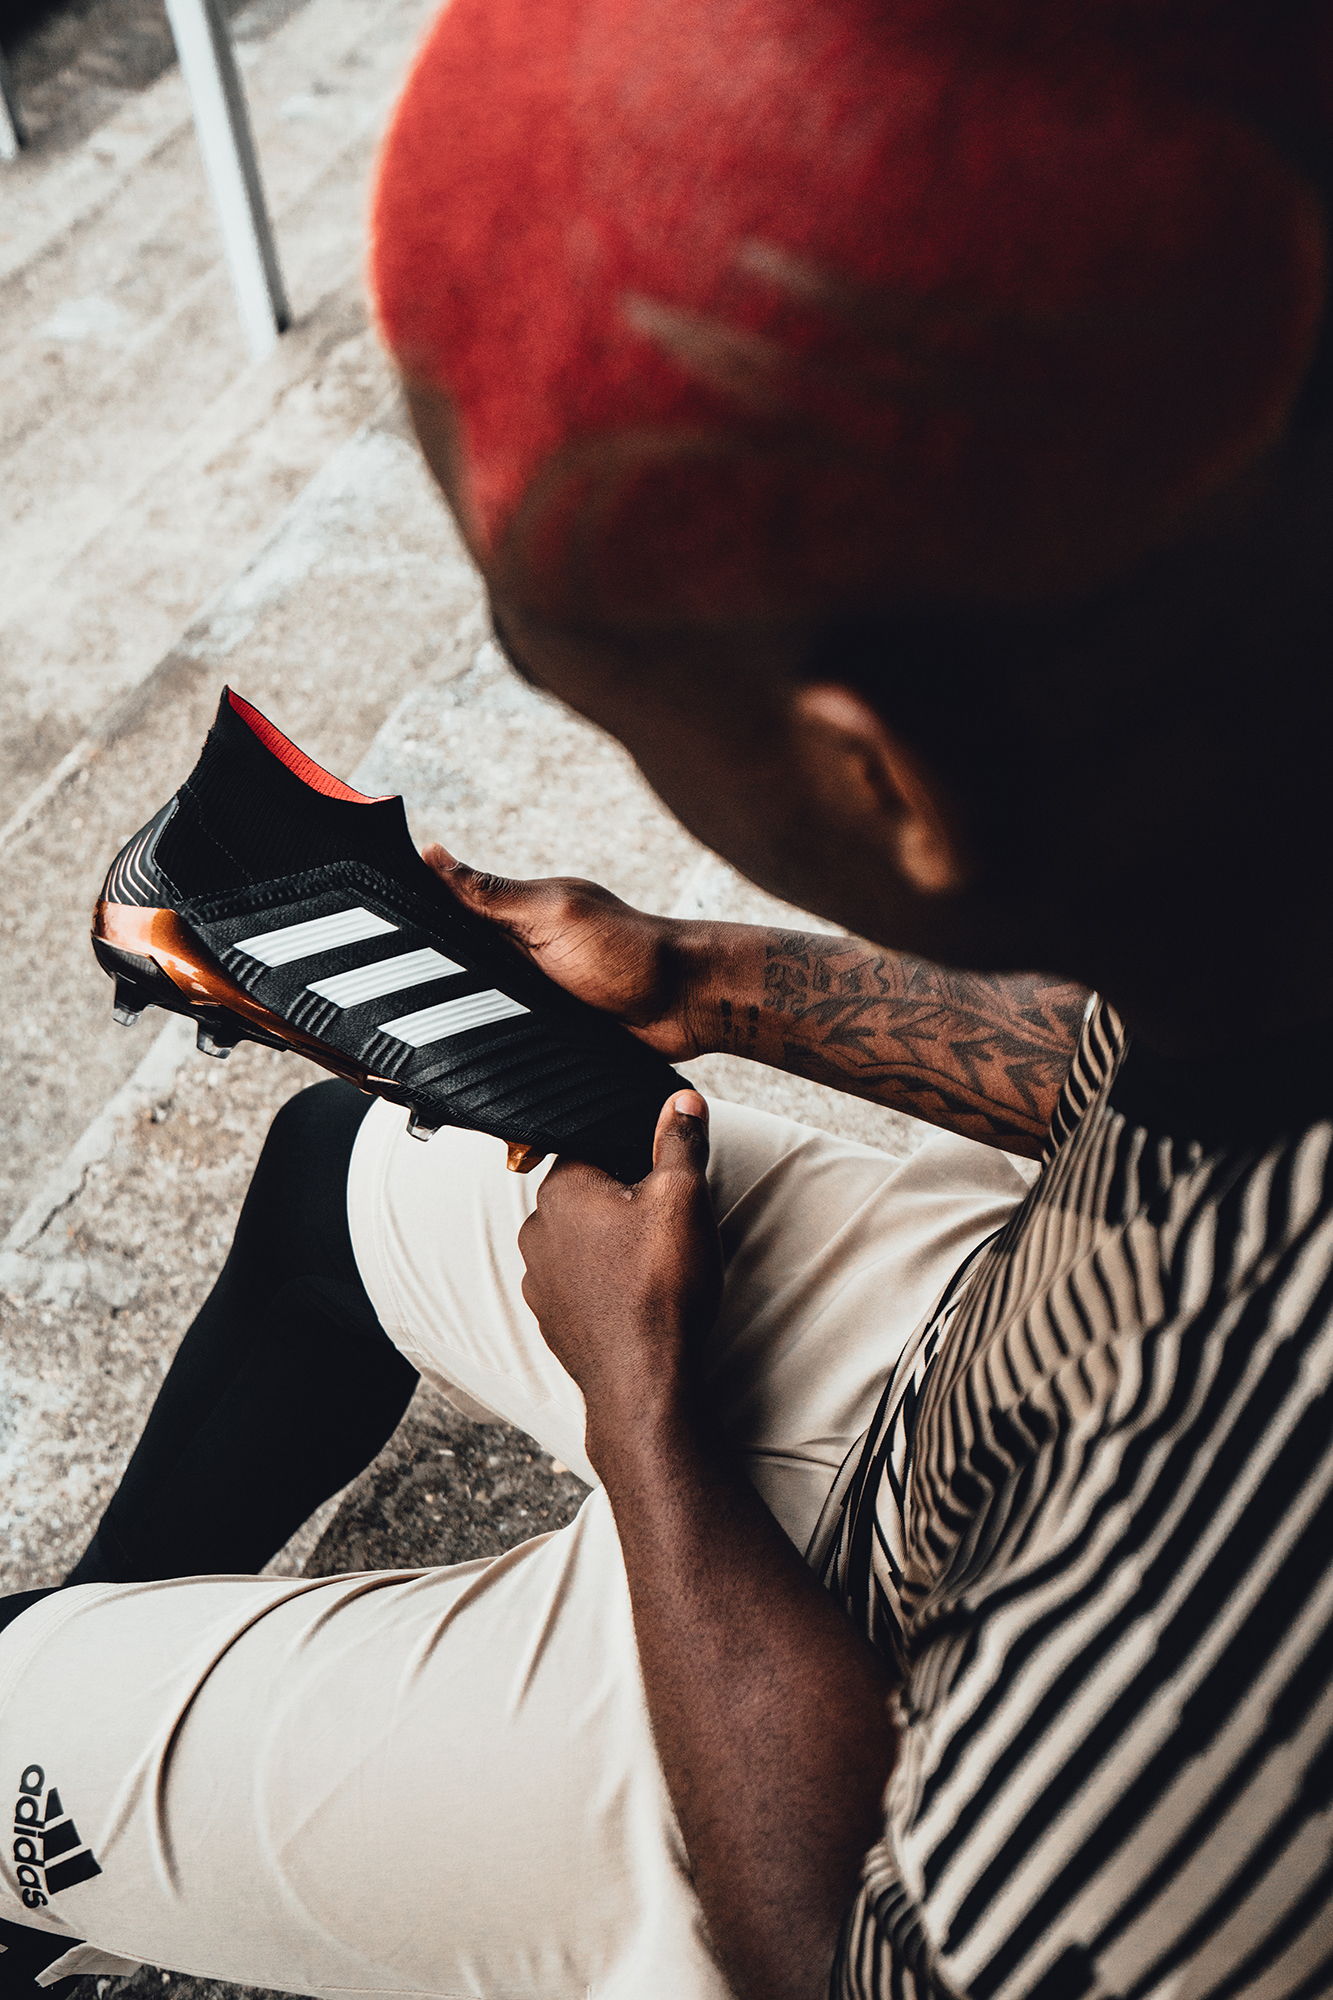 Adidas relance la Predator avec une version 2018